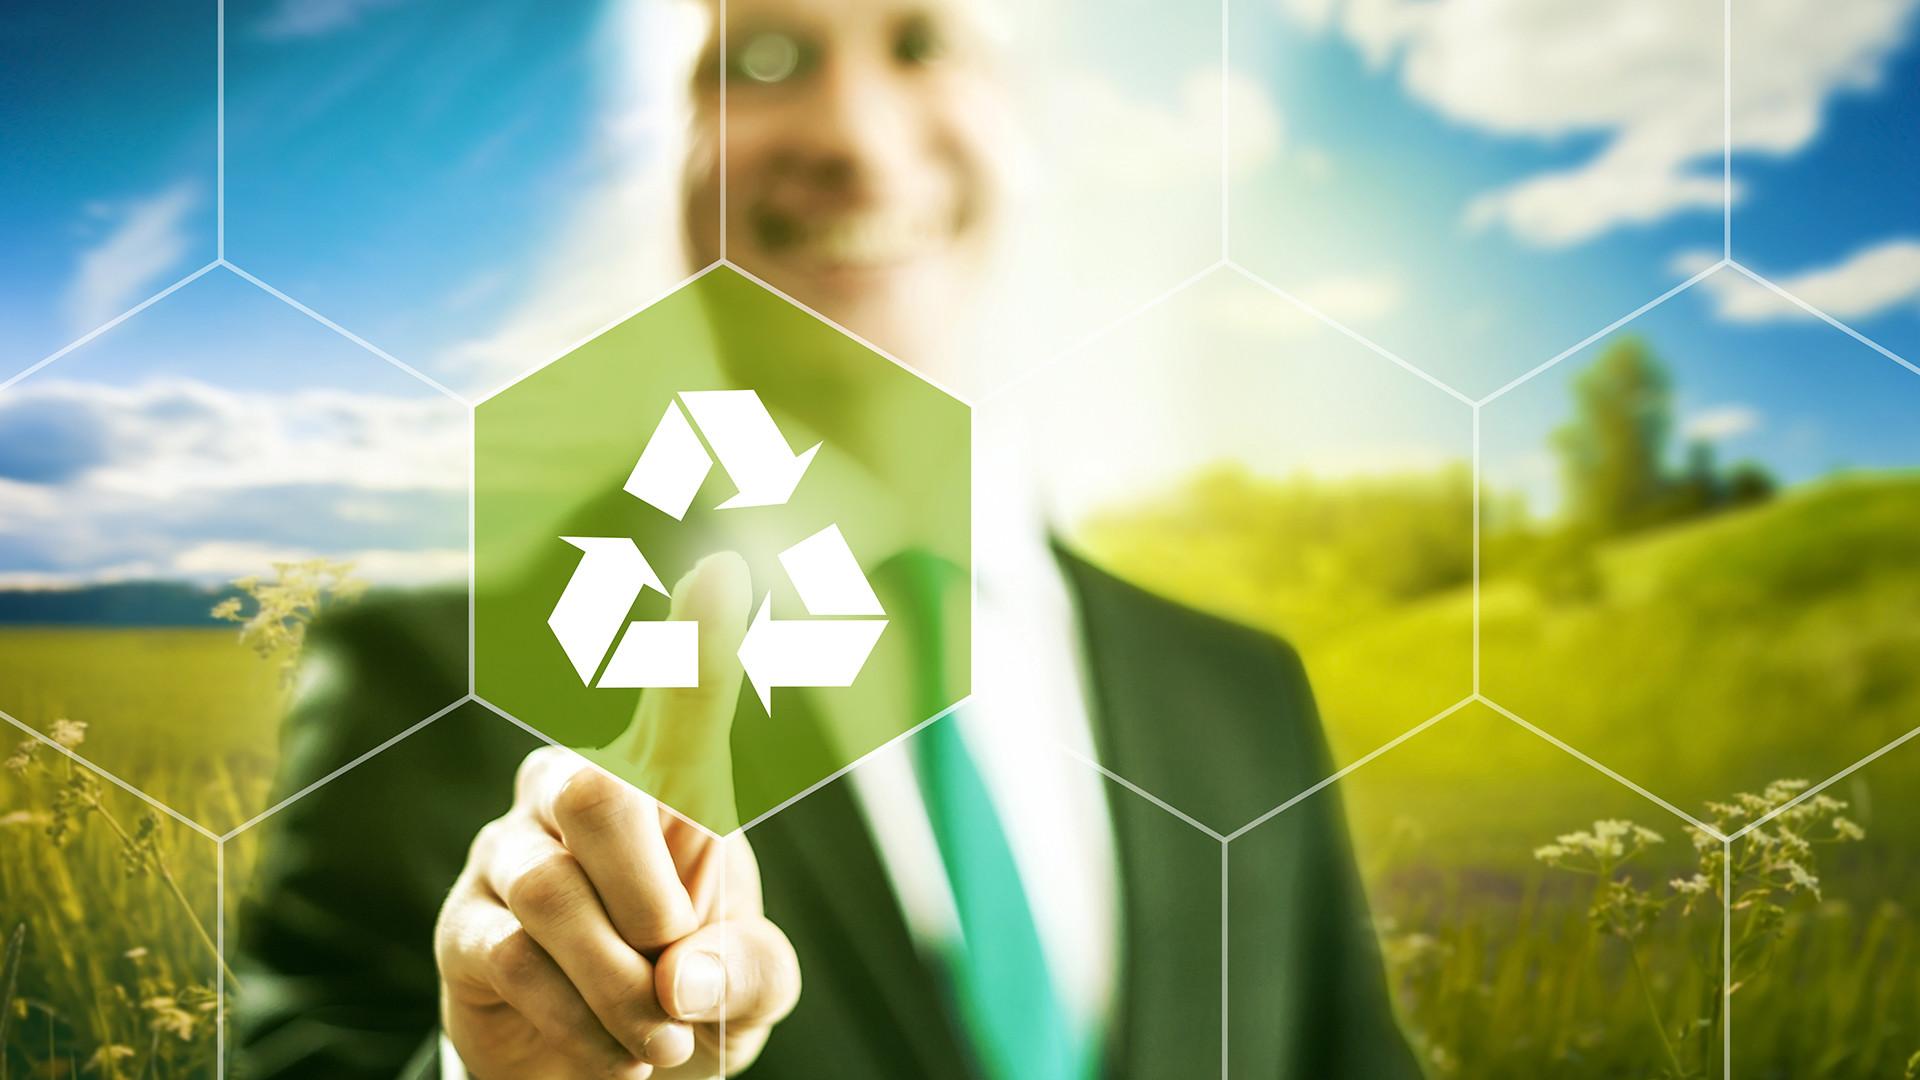 kibris rent a car cevre politikasi Çevre Politikası